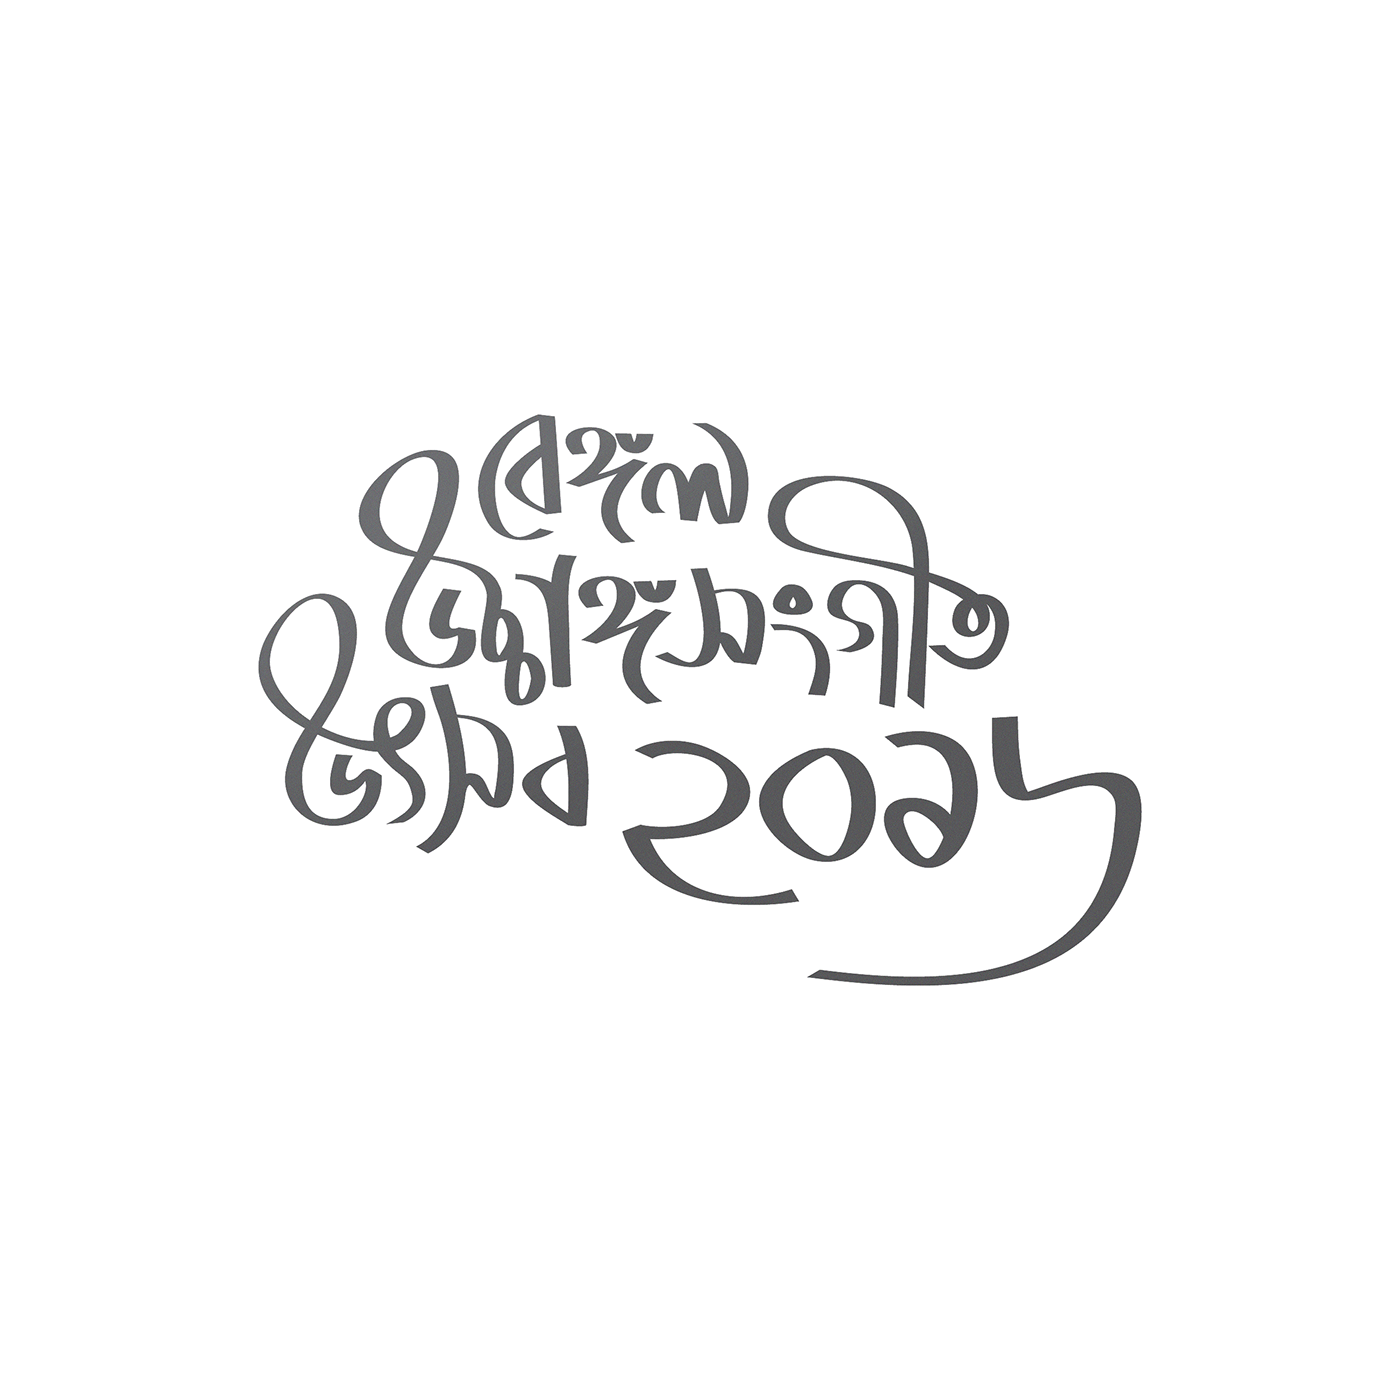 dhaka Event Branding concert graphics art Bangladesh BCMF music